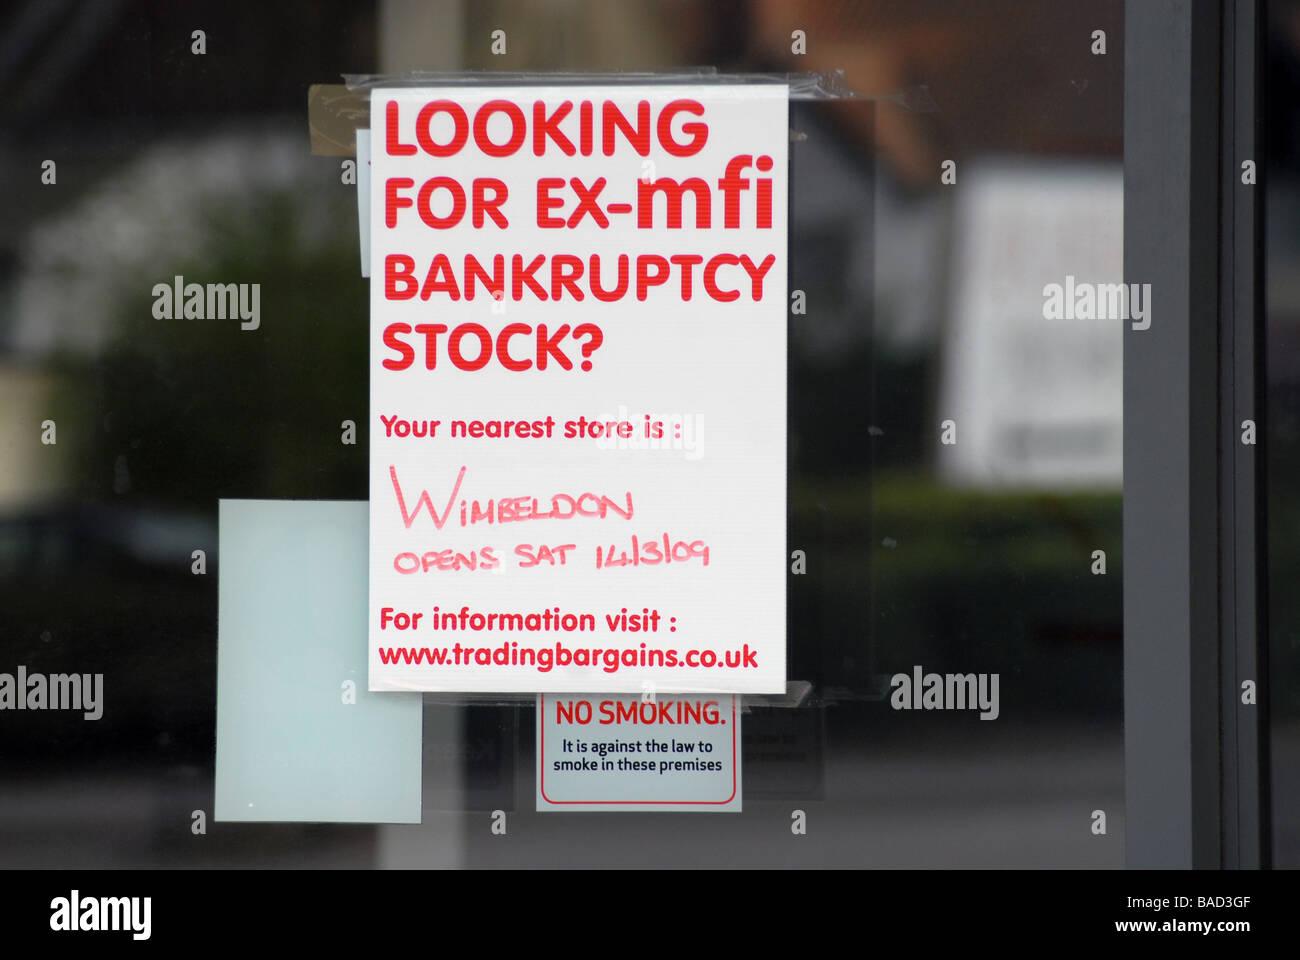 Mfi Store Stock Photos & Mfi Store Stock Images - Alamy